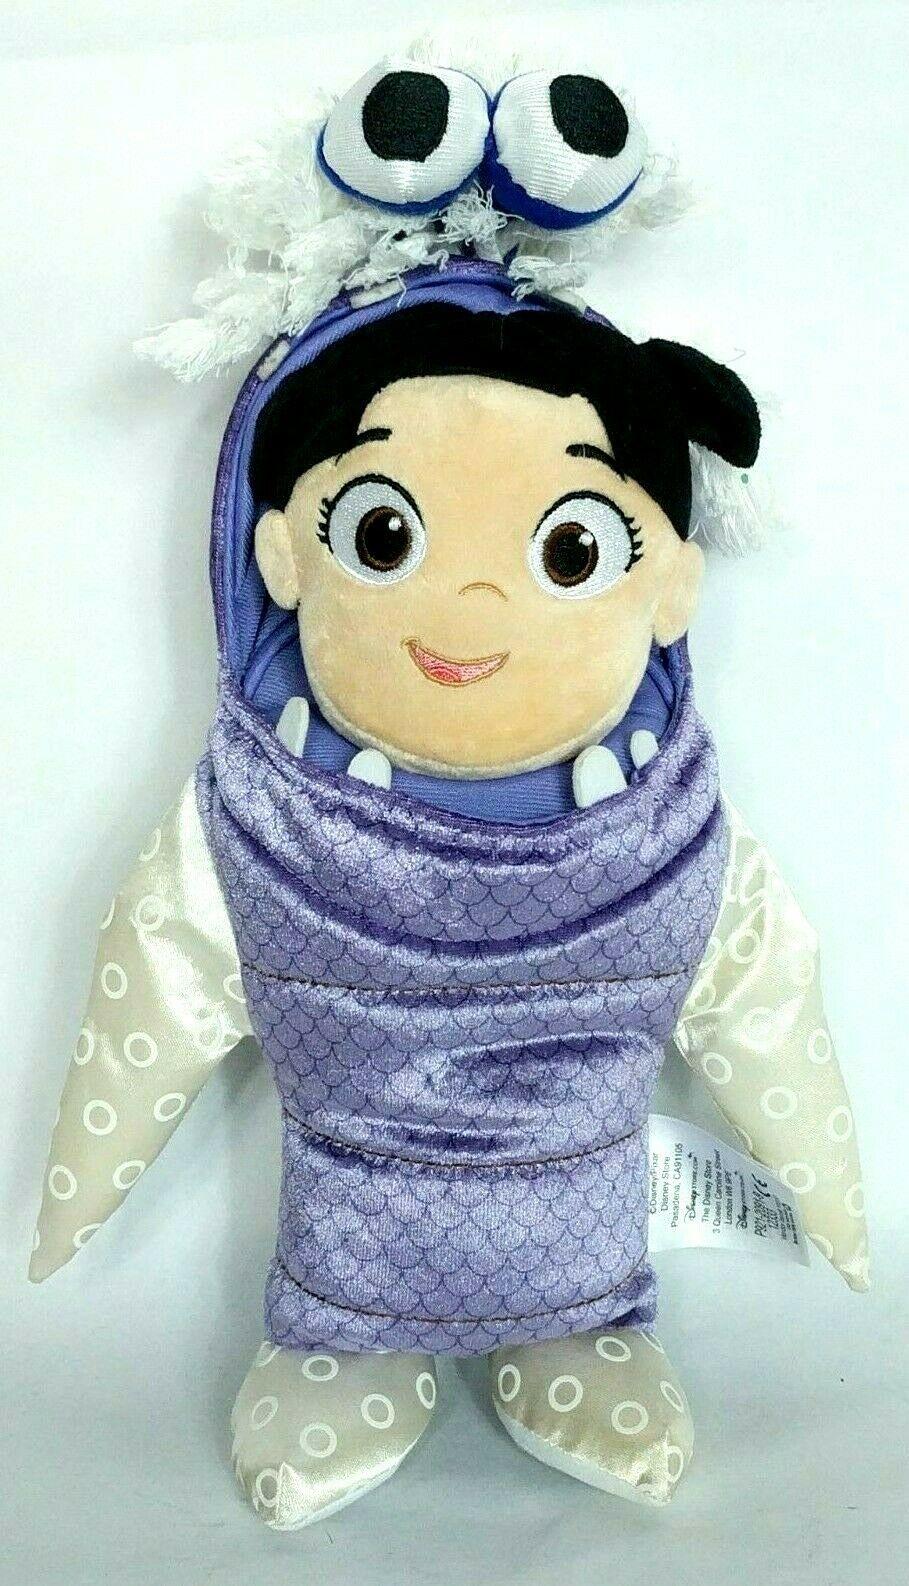 "Disney Store Pixar Monsters Inc Boo In Costume Plush Stuffed Animal 15"""